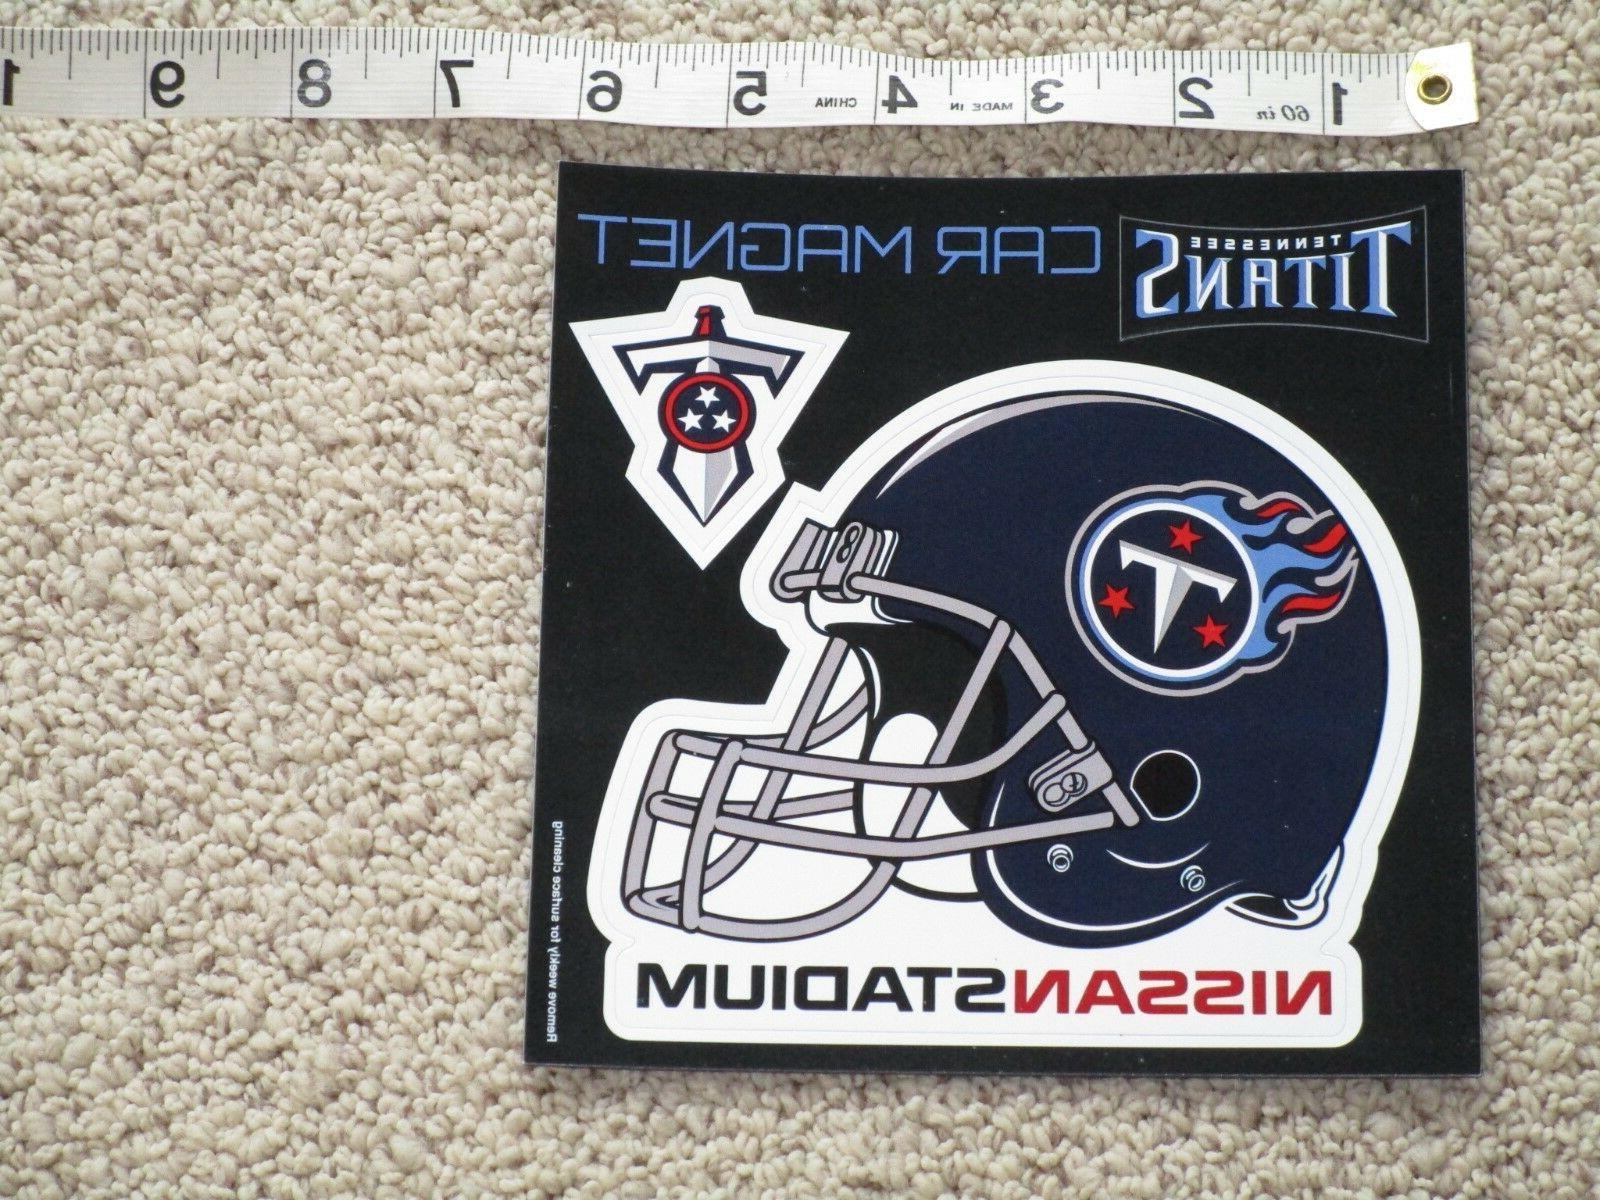 new tennessee titans helmet sword car magnet